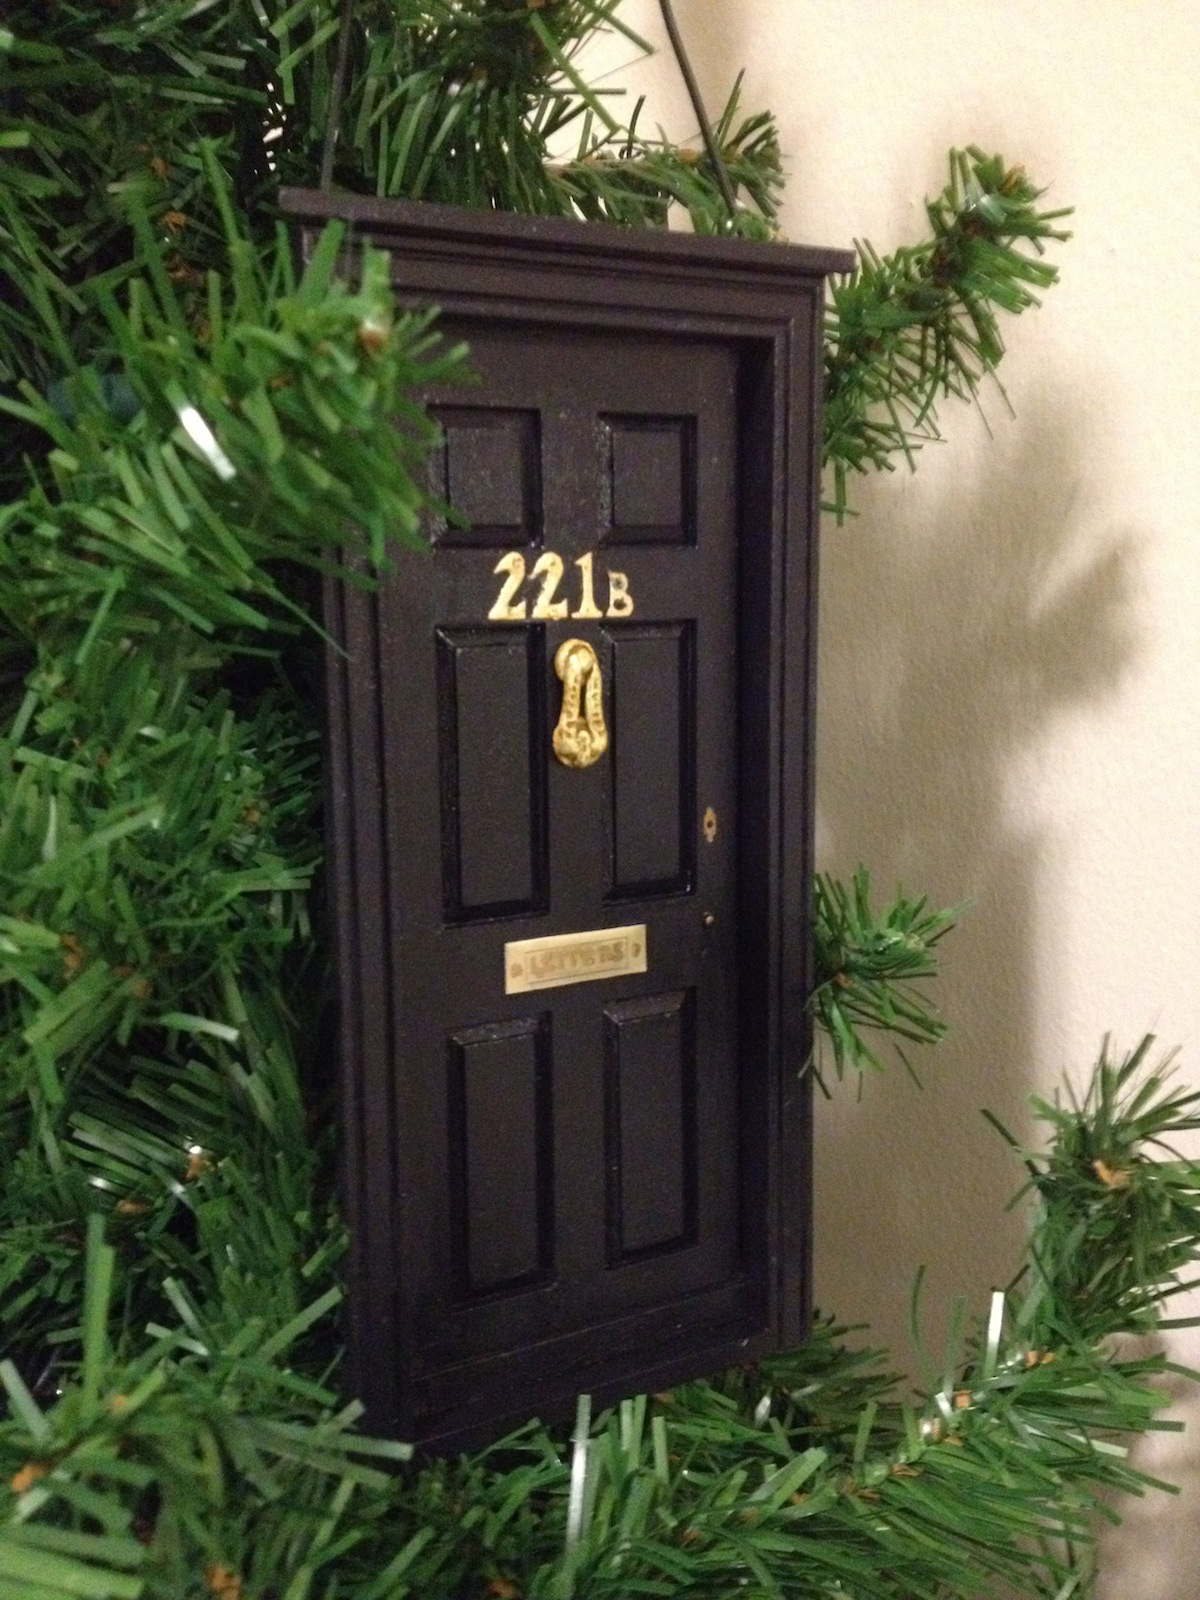 Picture of Make a 221B Baker Street Christmas Ornament (BBC Sherlock)